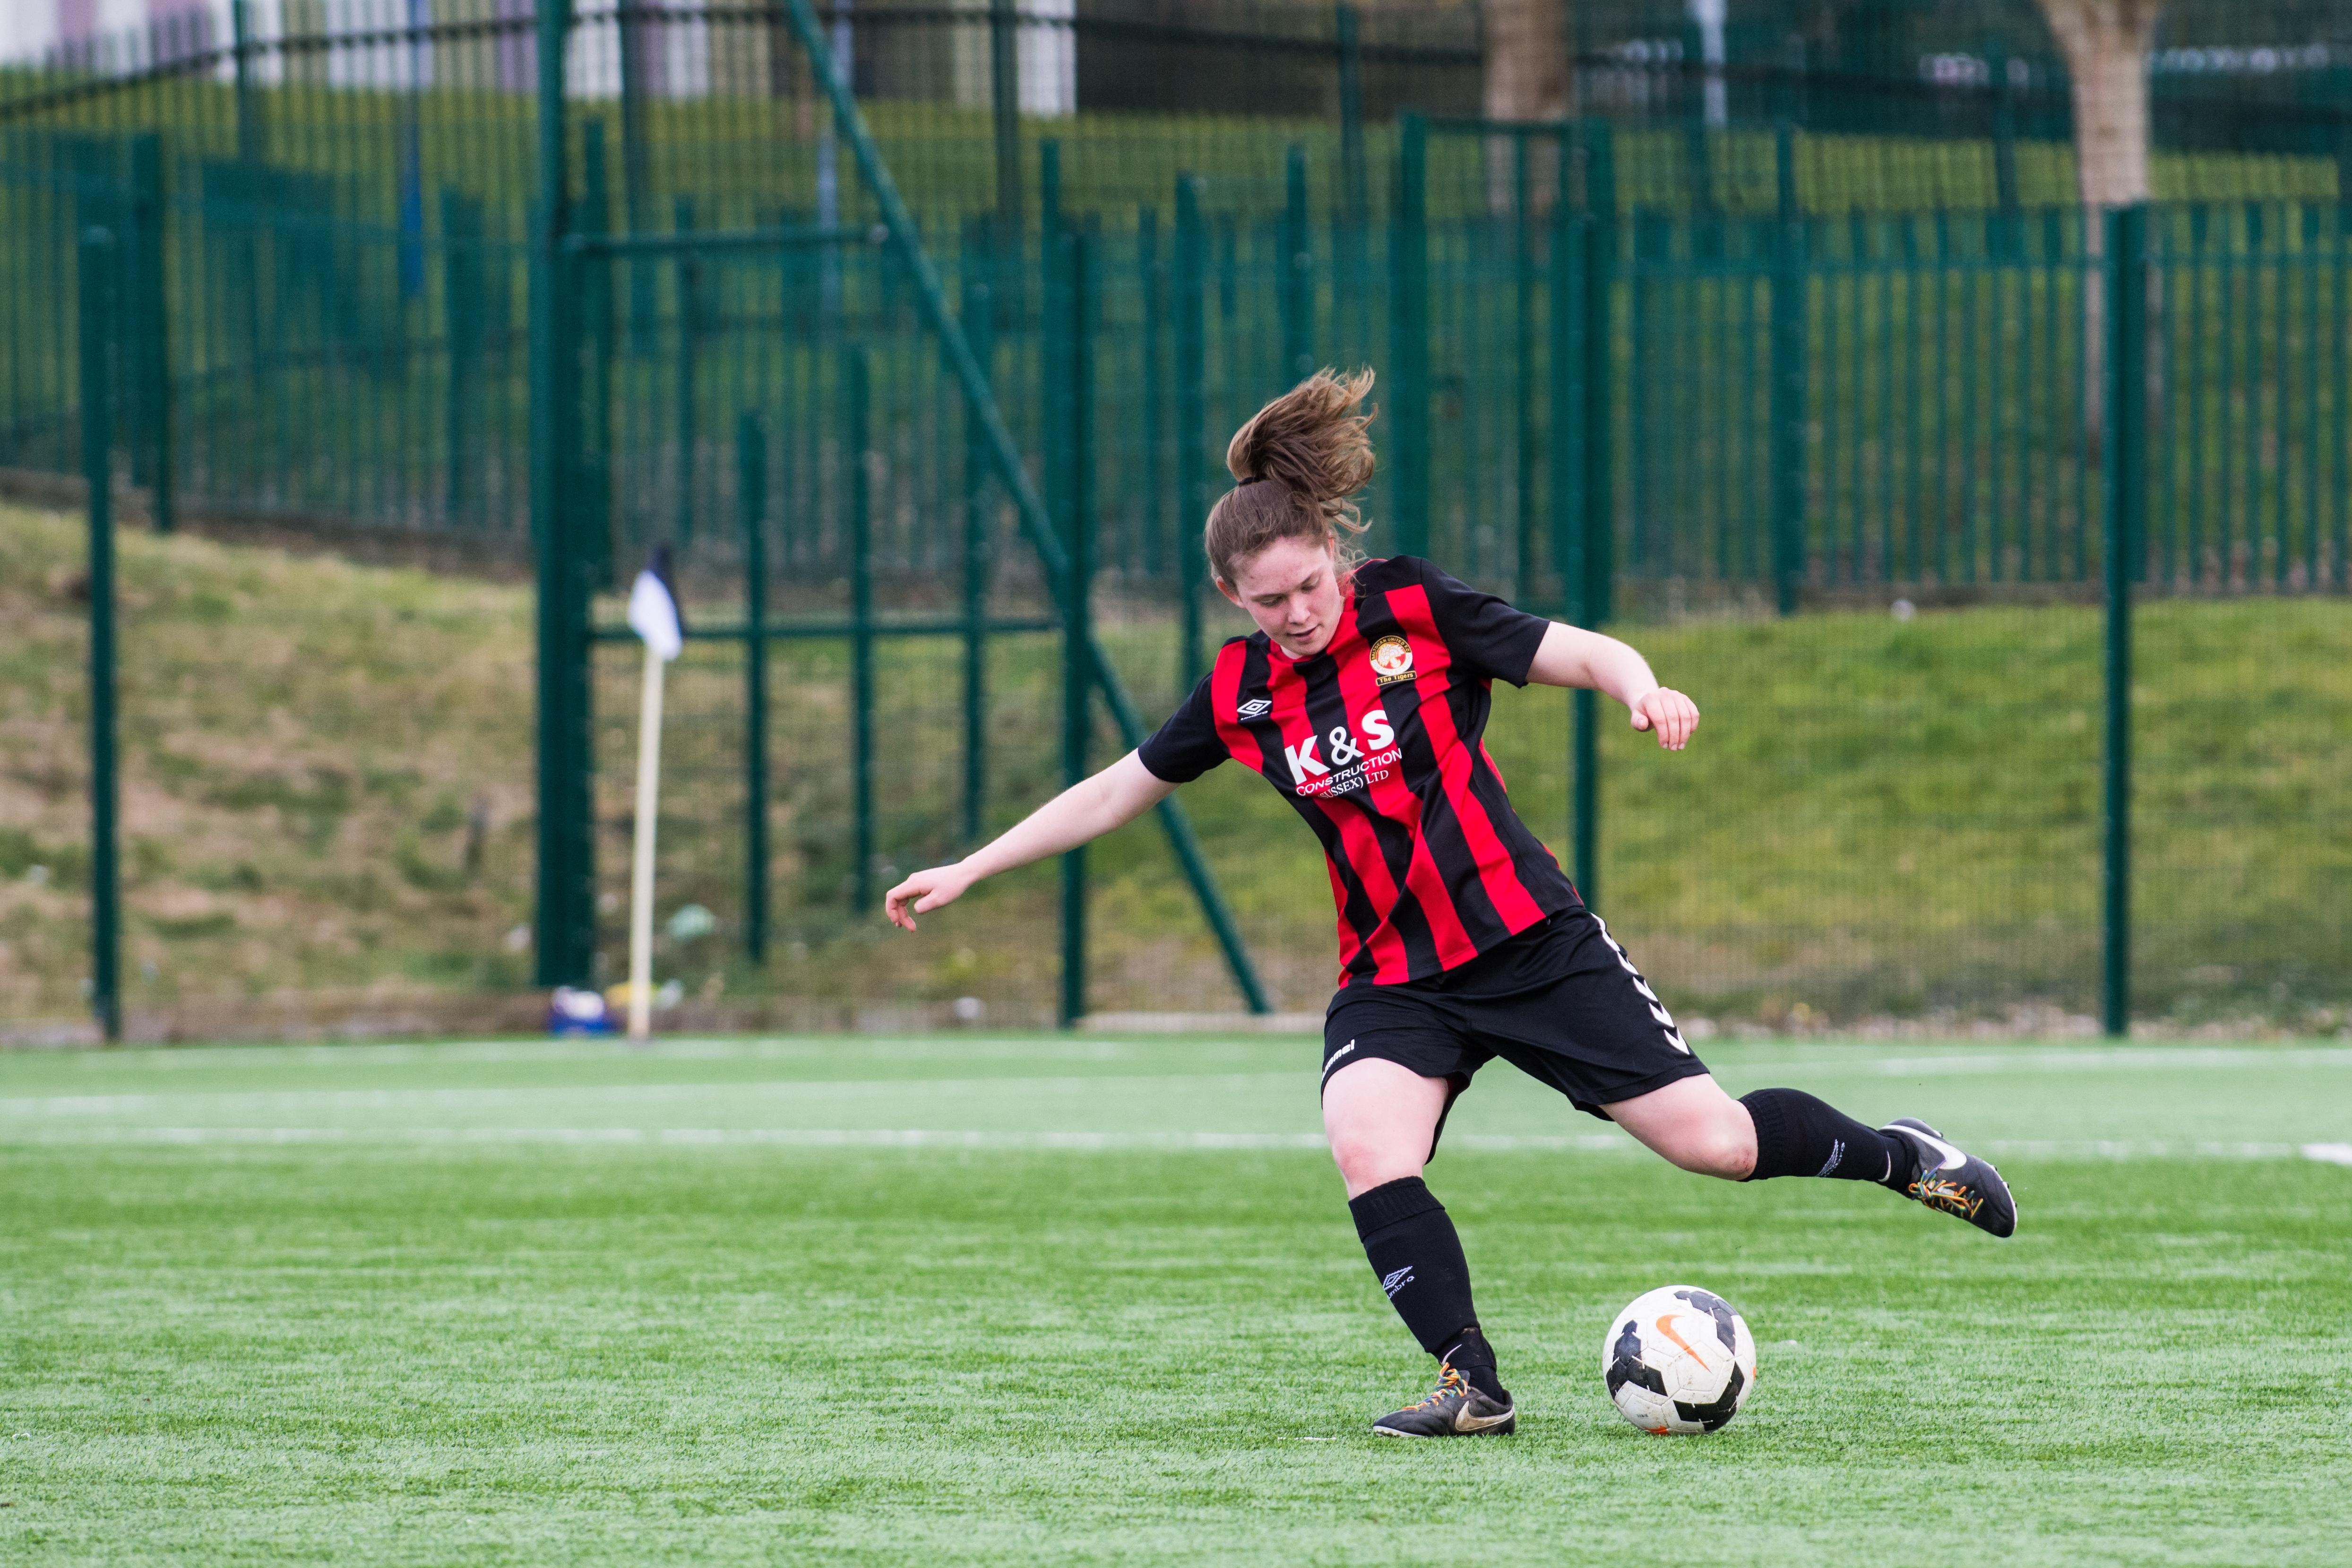 DAVID_JEFFERY Saltdean Utd Ladies FC vs Worthing Utd Ladies FC 11.03.18 32